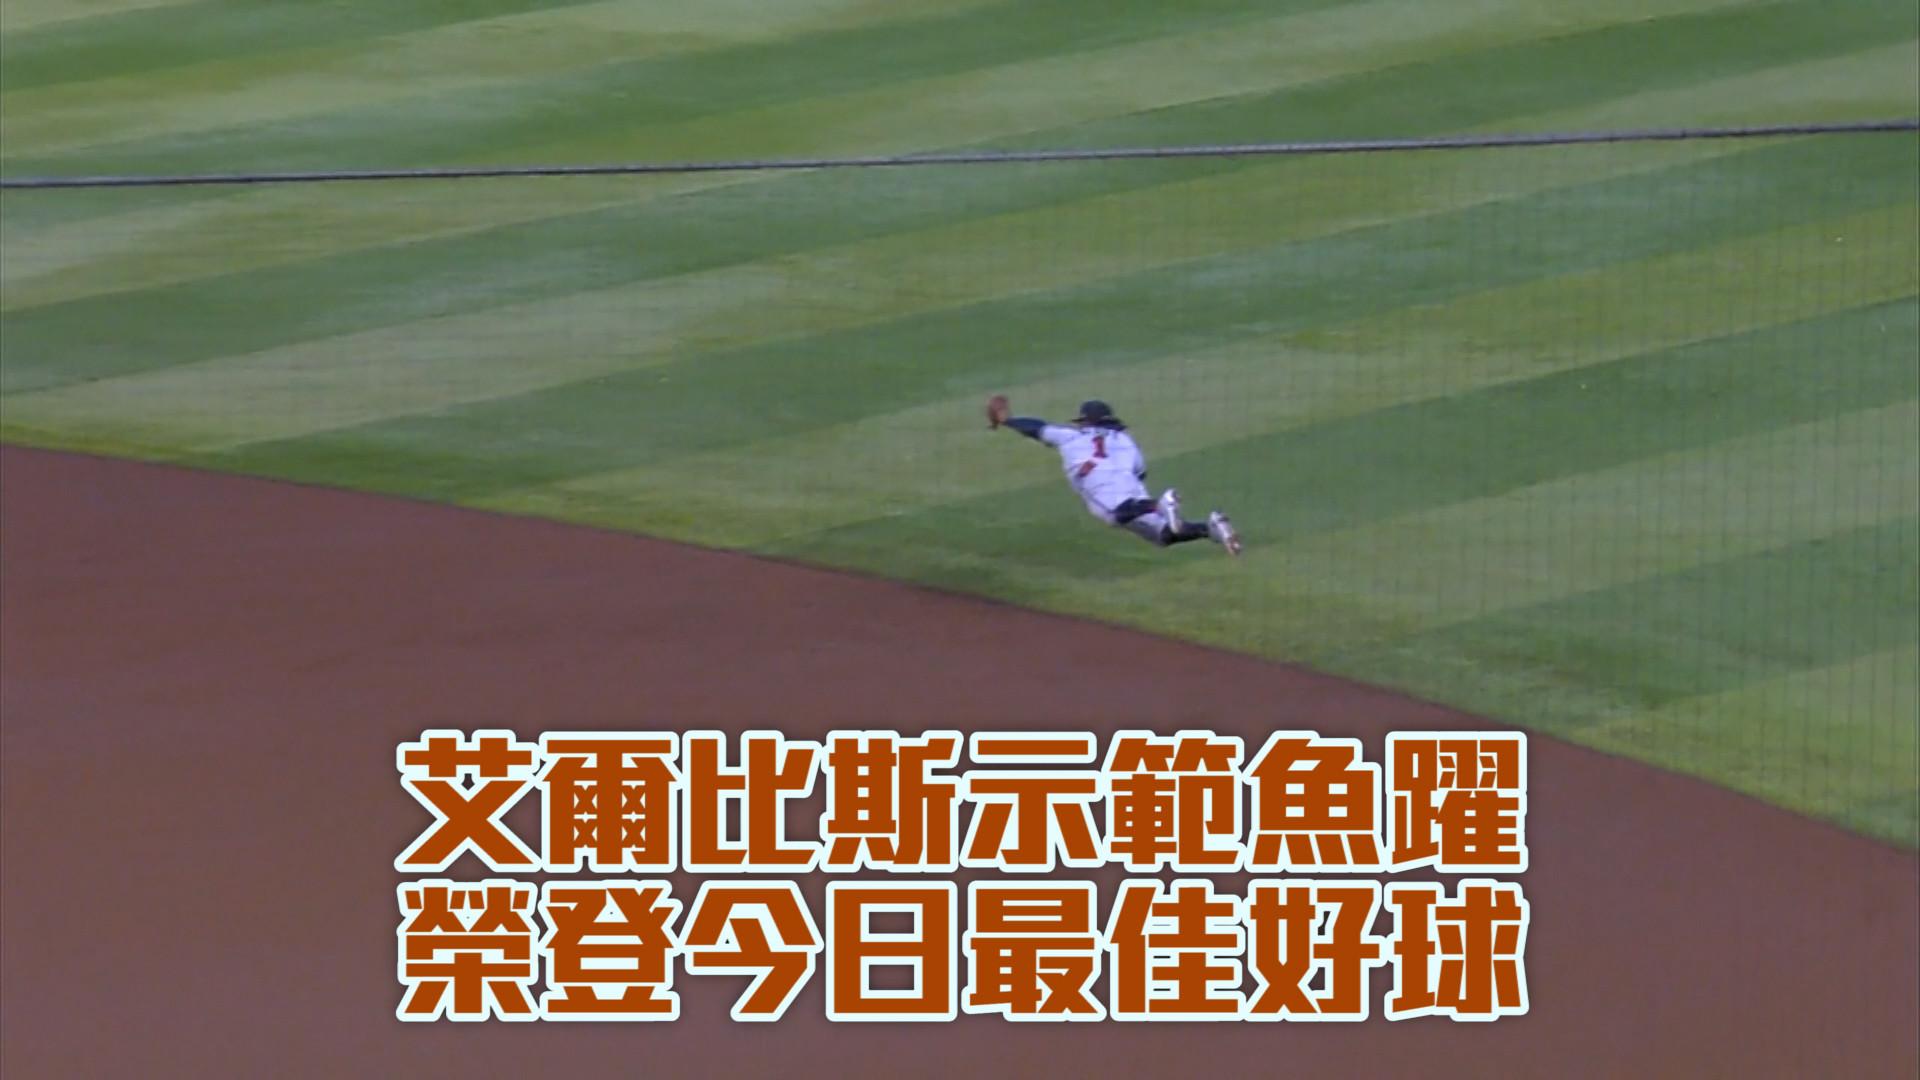 【MLB看愛爾達】艾爾比斯示範魚躍 榮登今日最佳好球 9/24